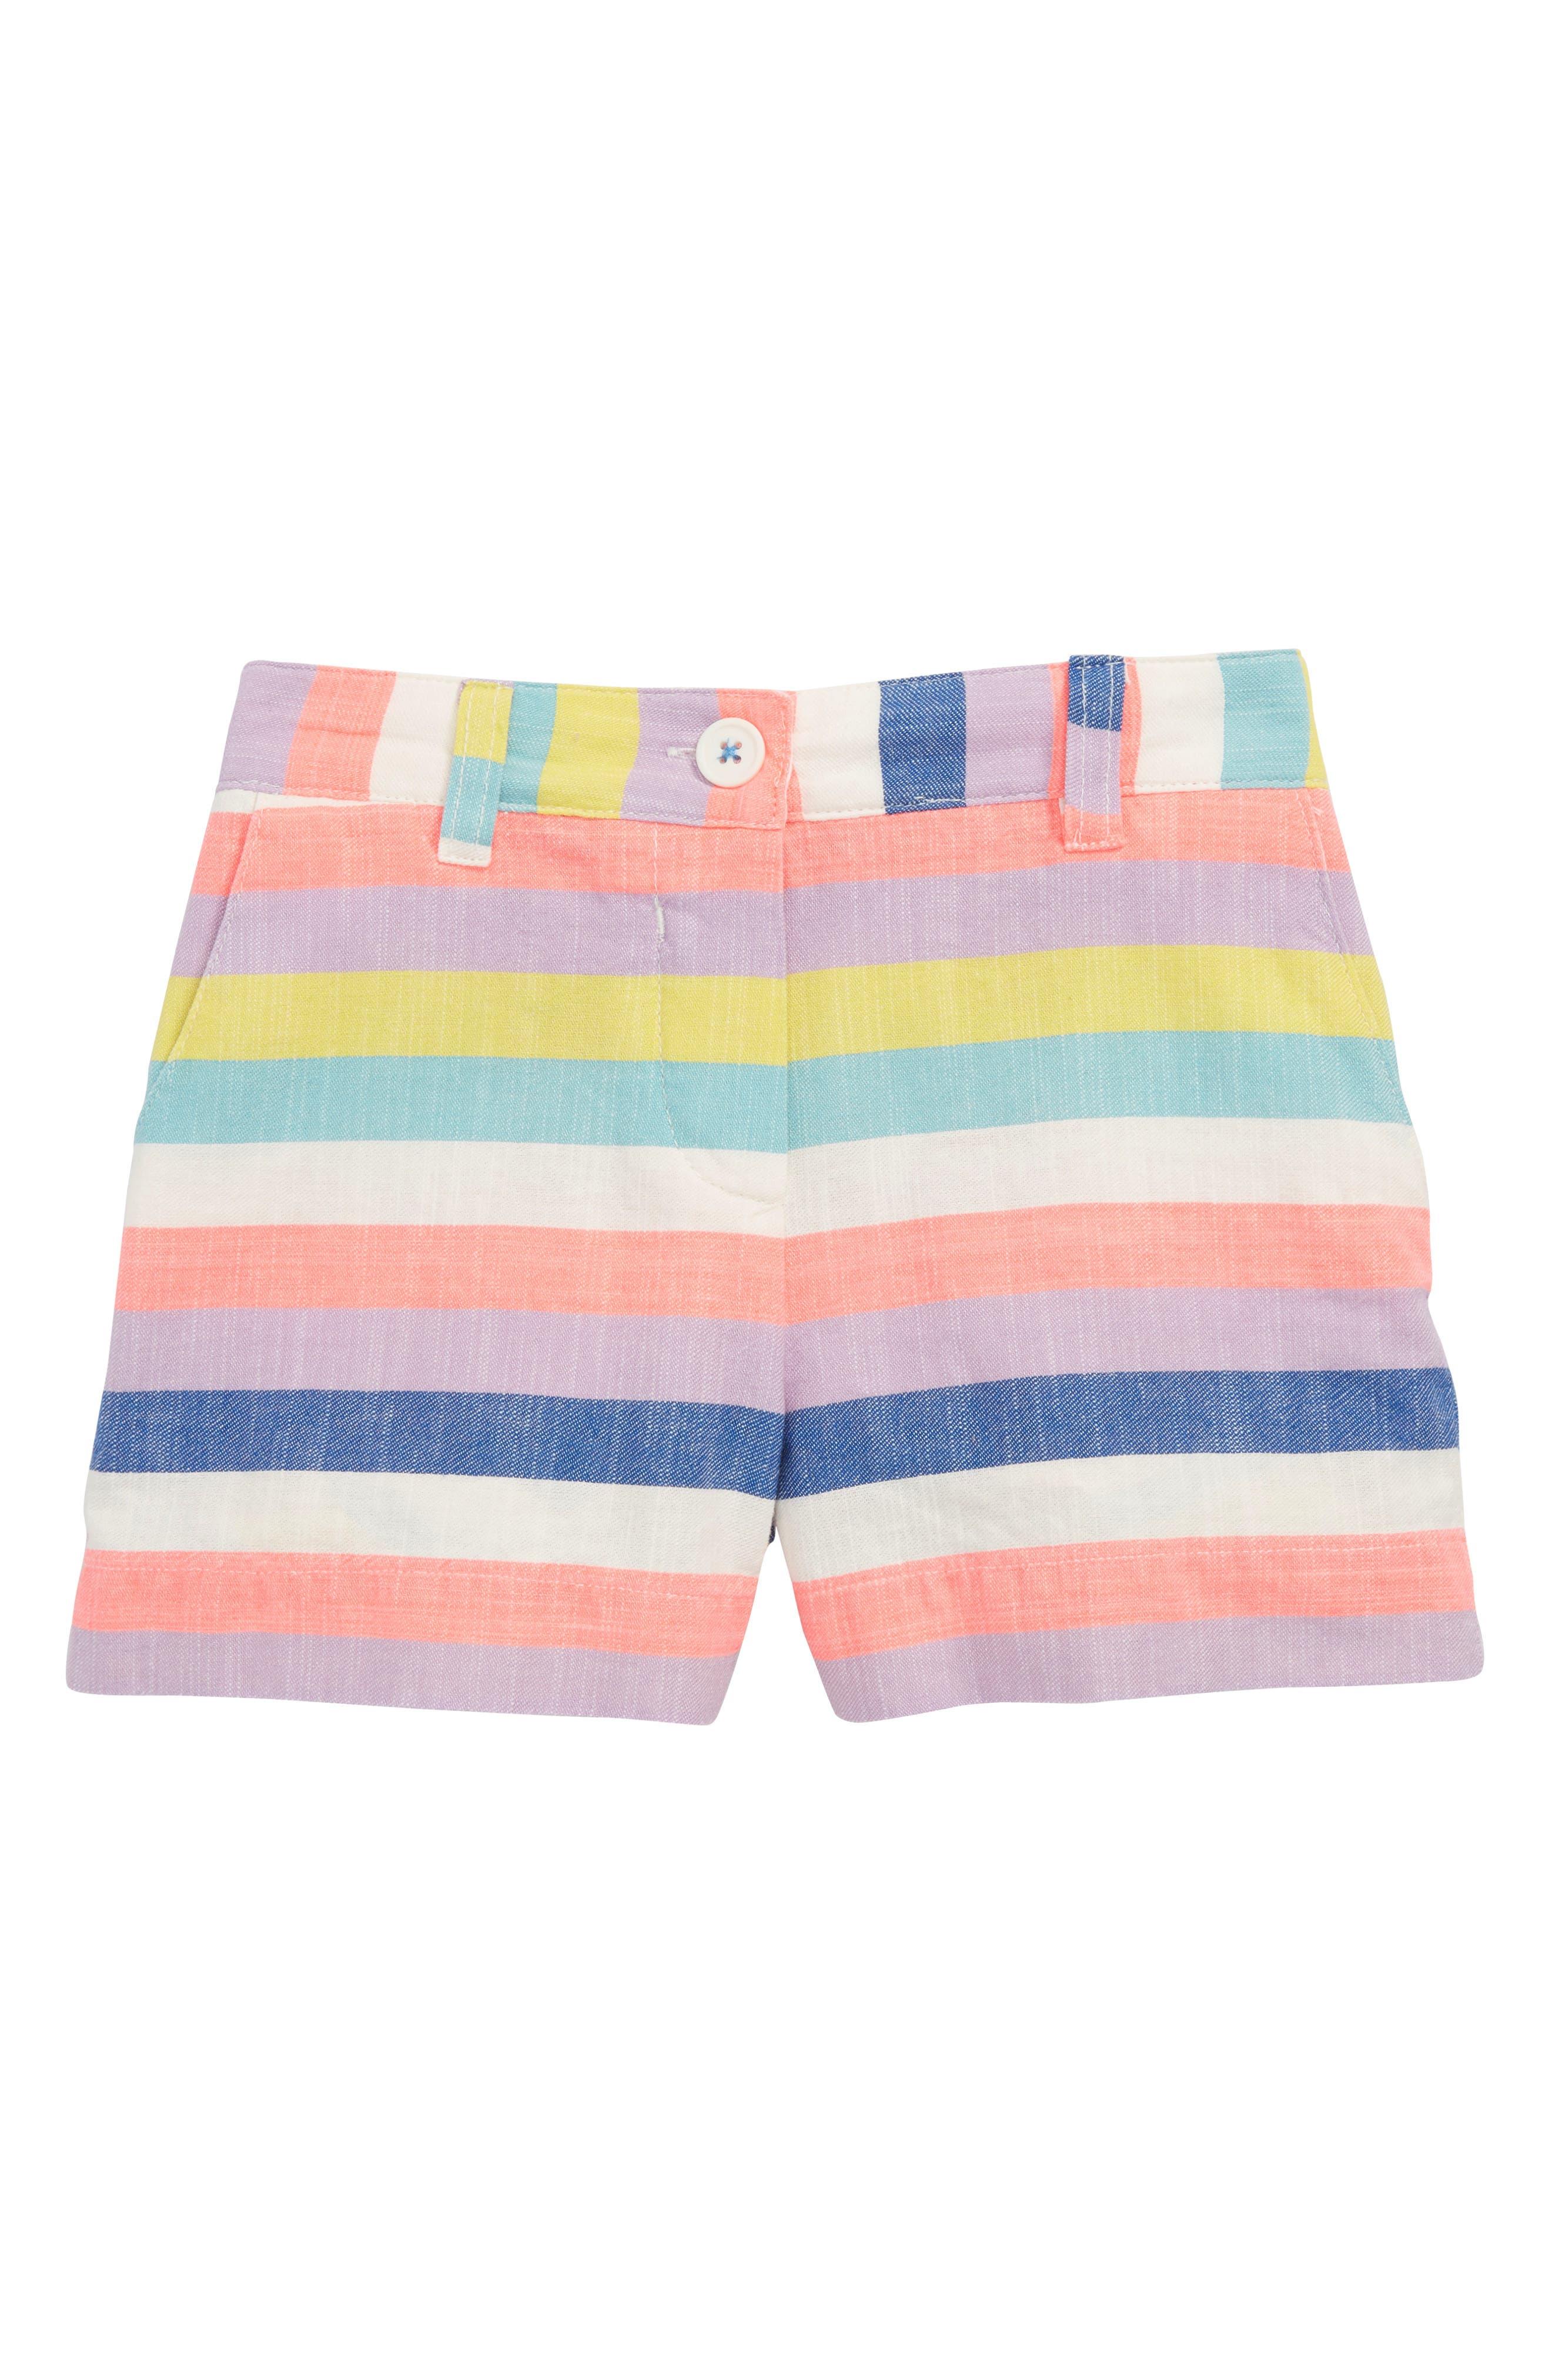 Bright Adventure Shorts,                         Main,                         color,